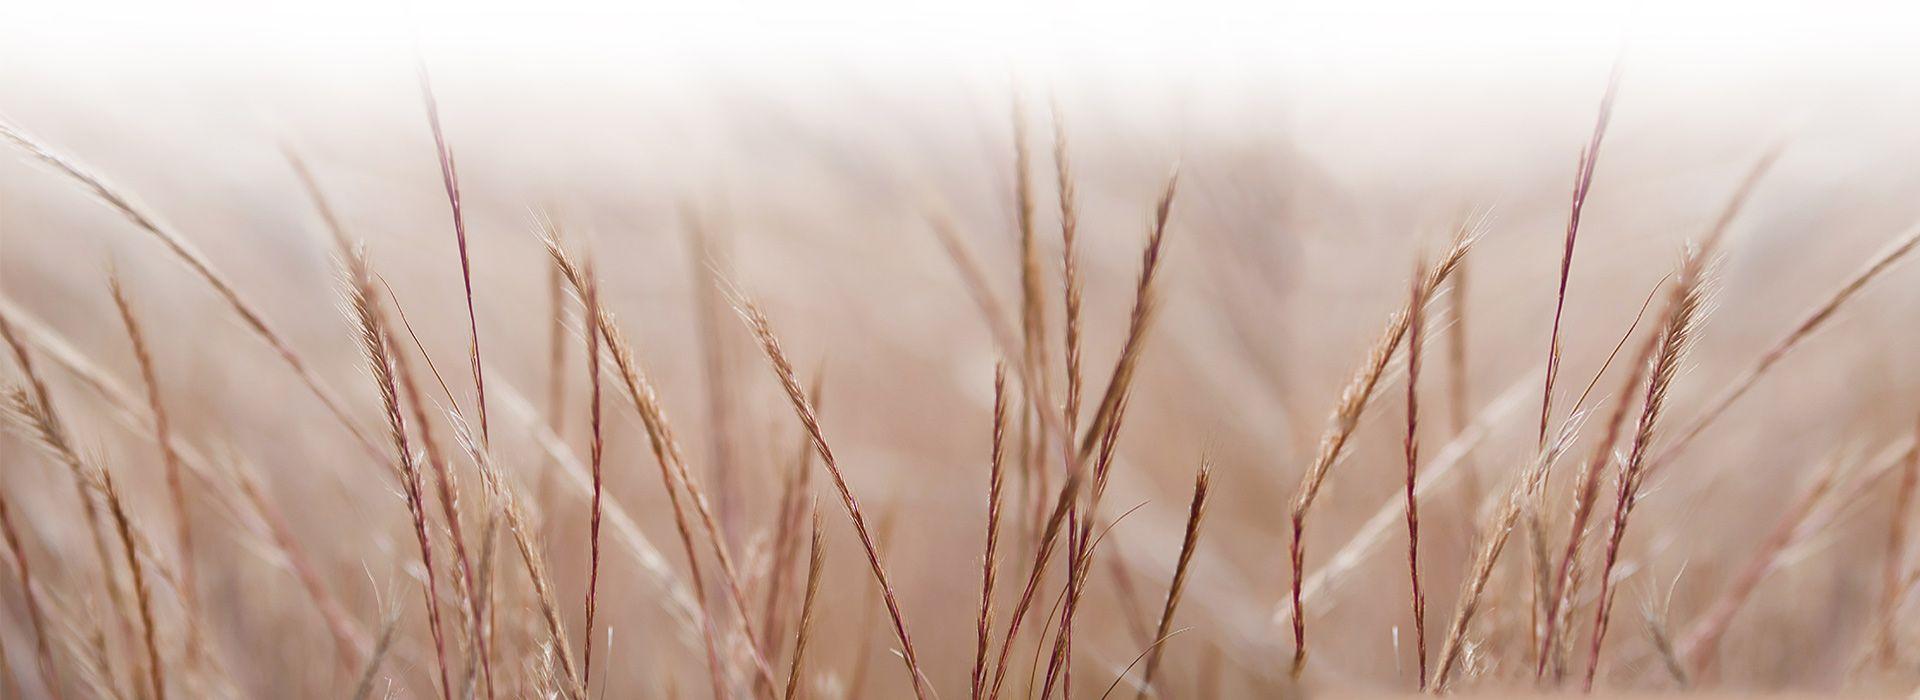 pamper grass